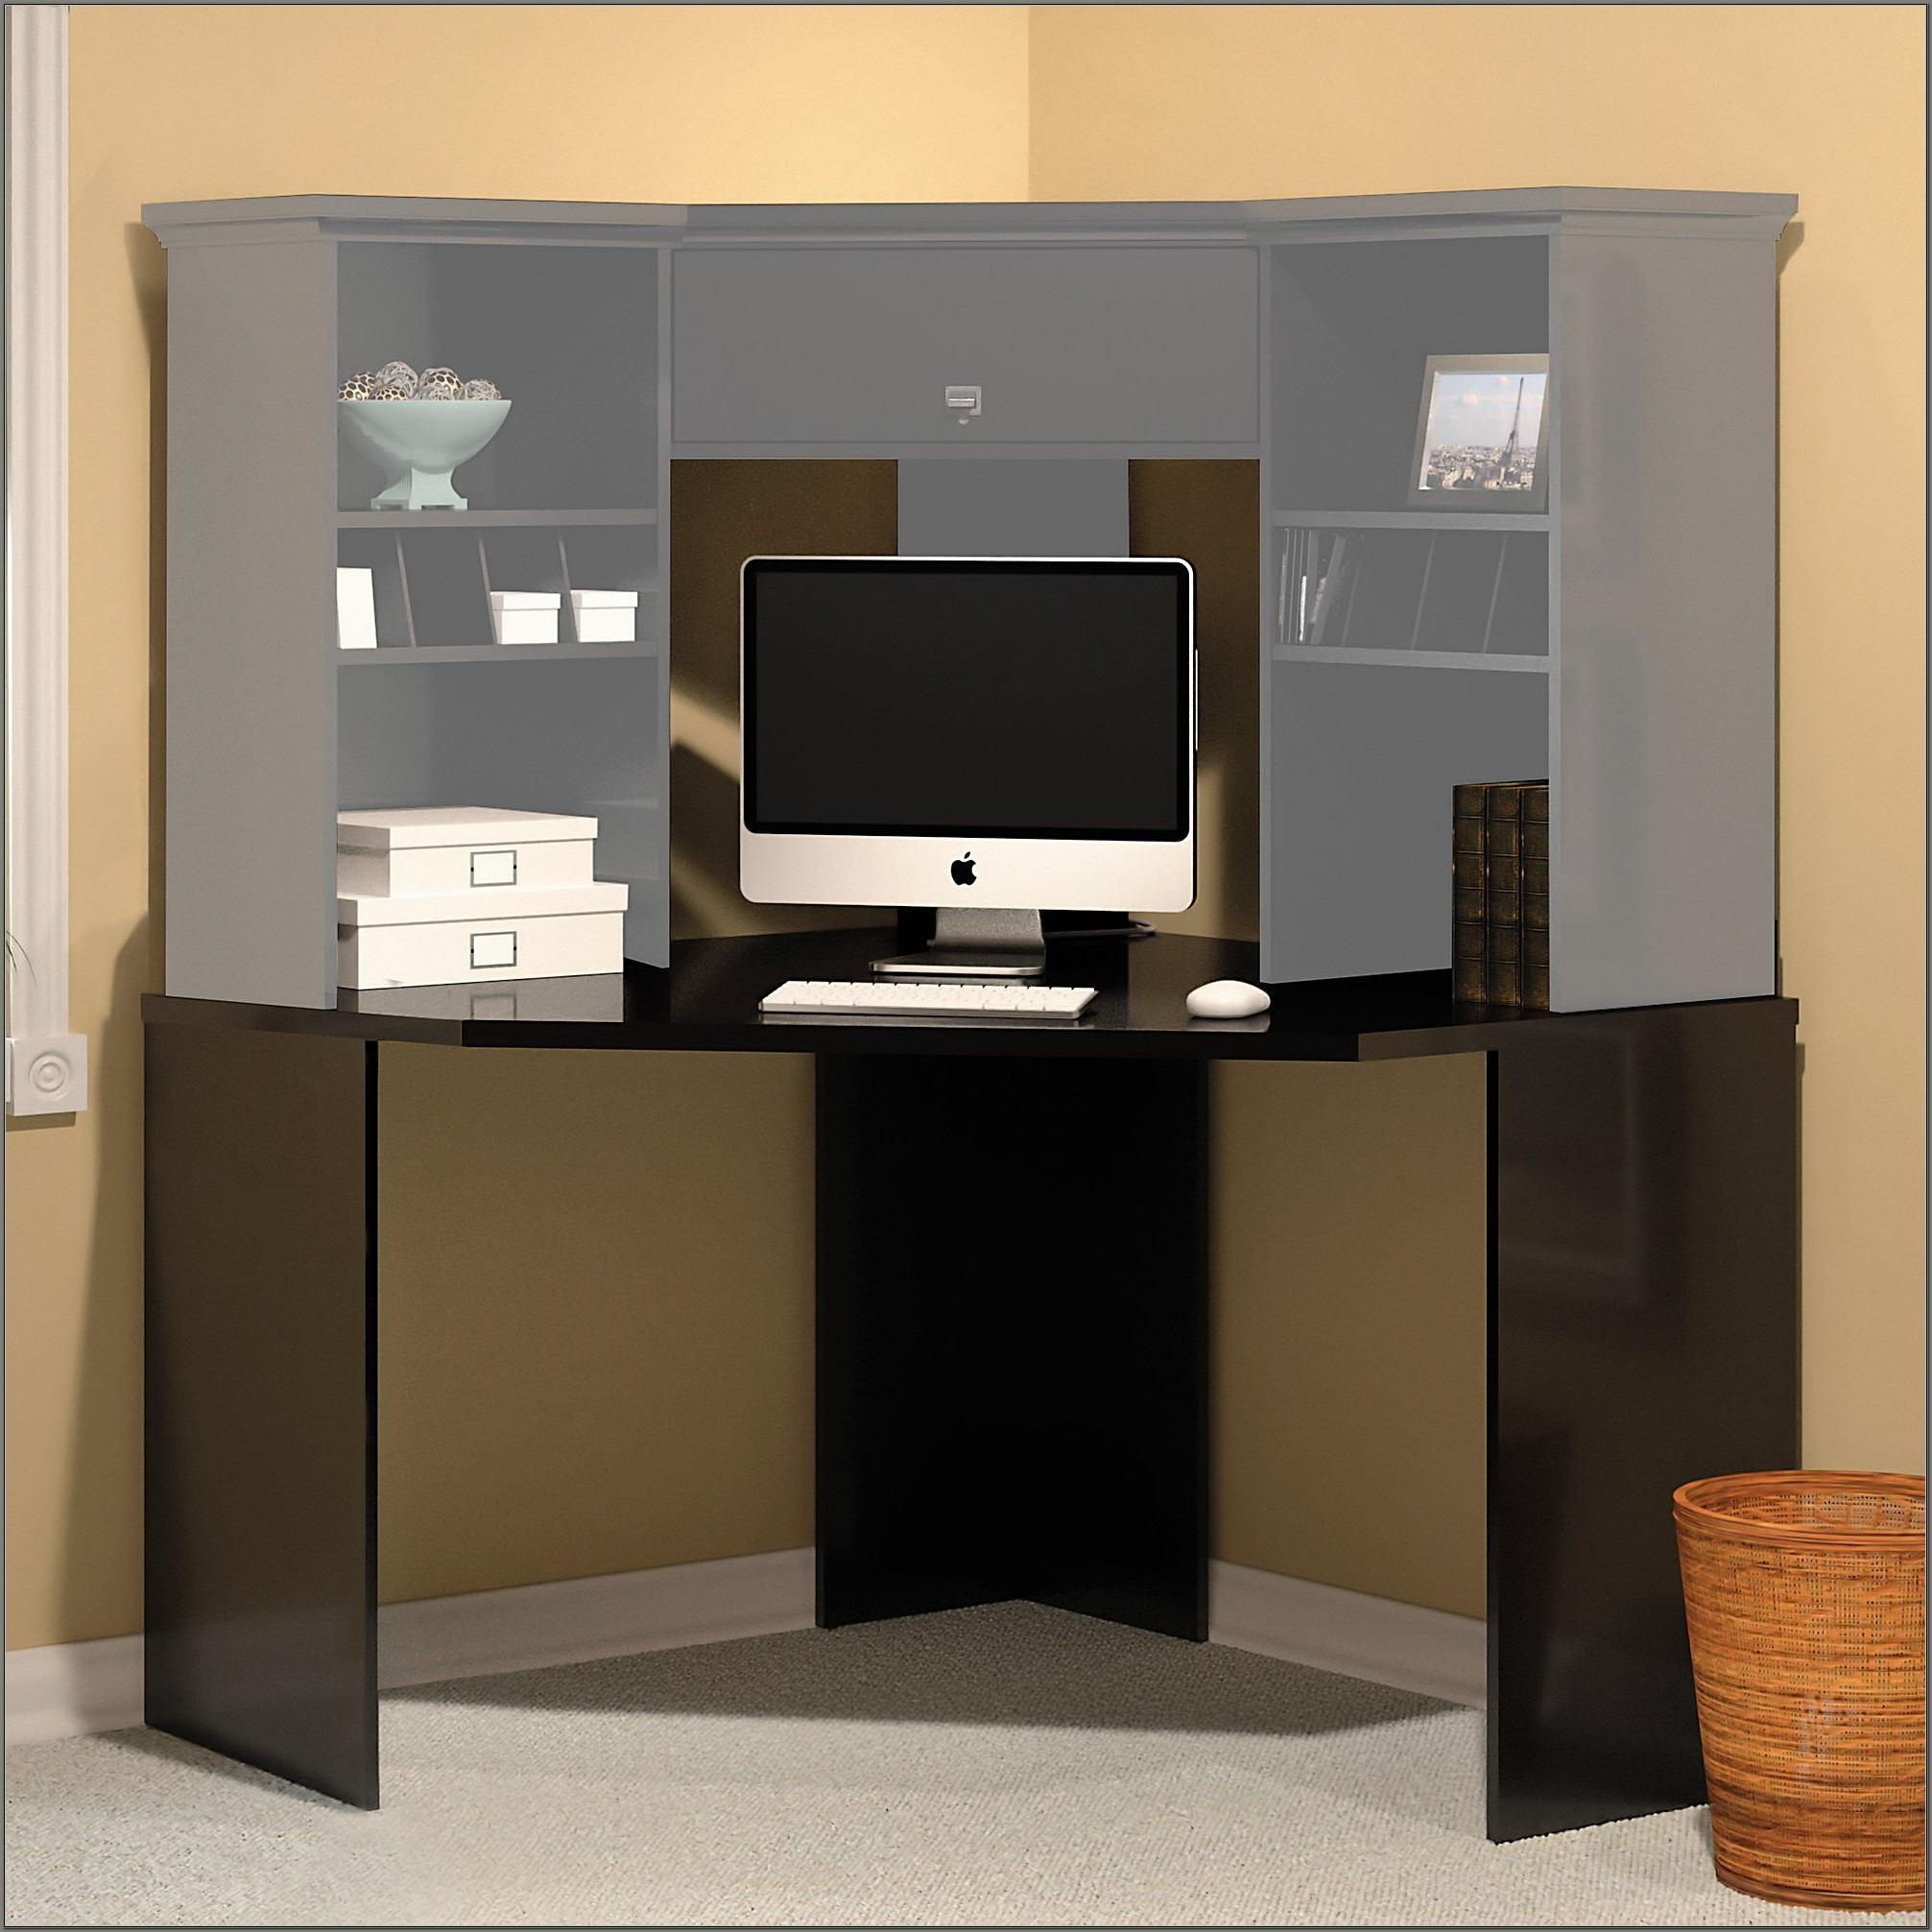 Bush Stockport Corner Computer Desk Black